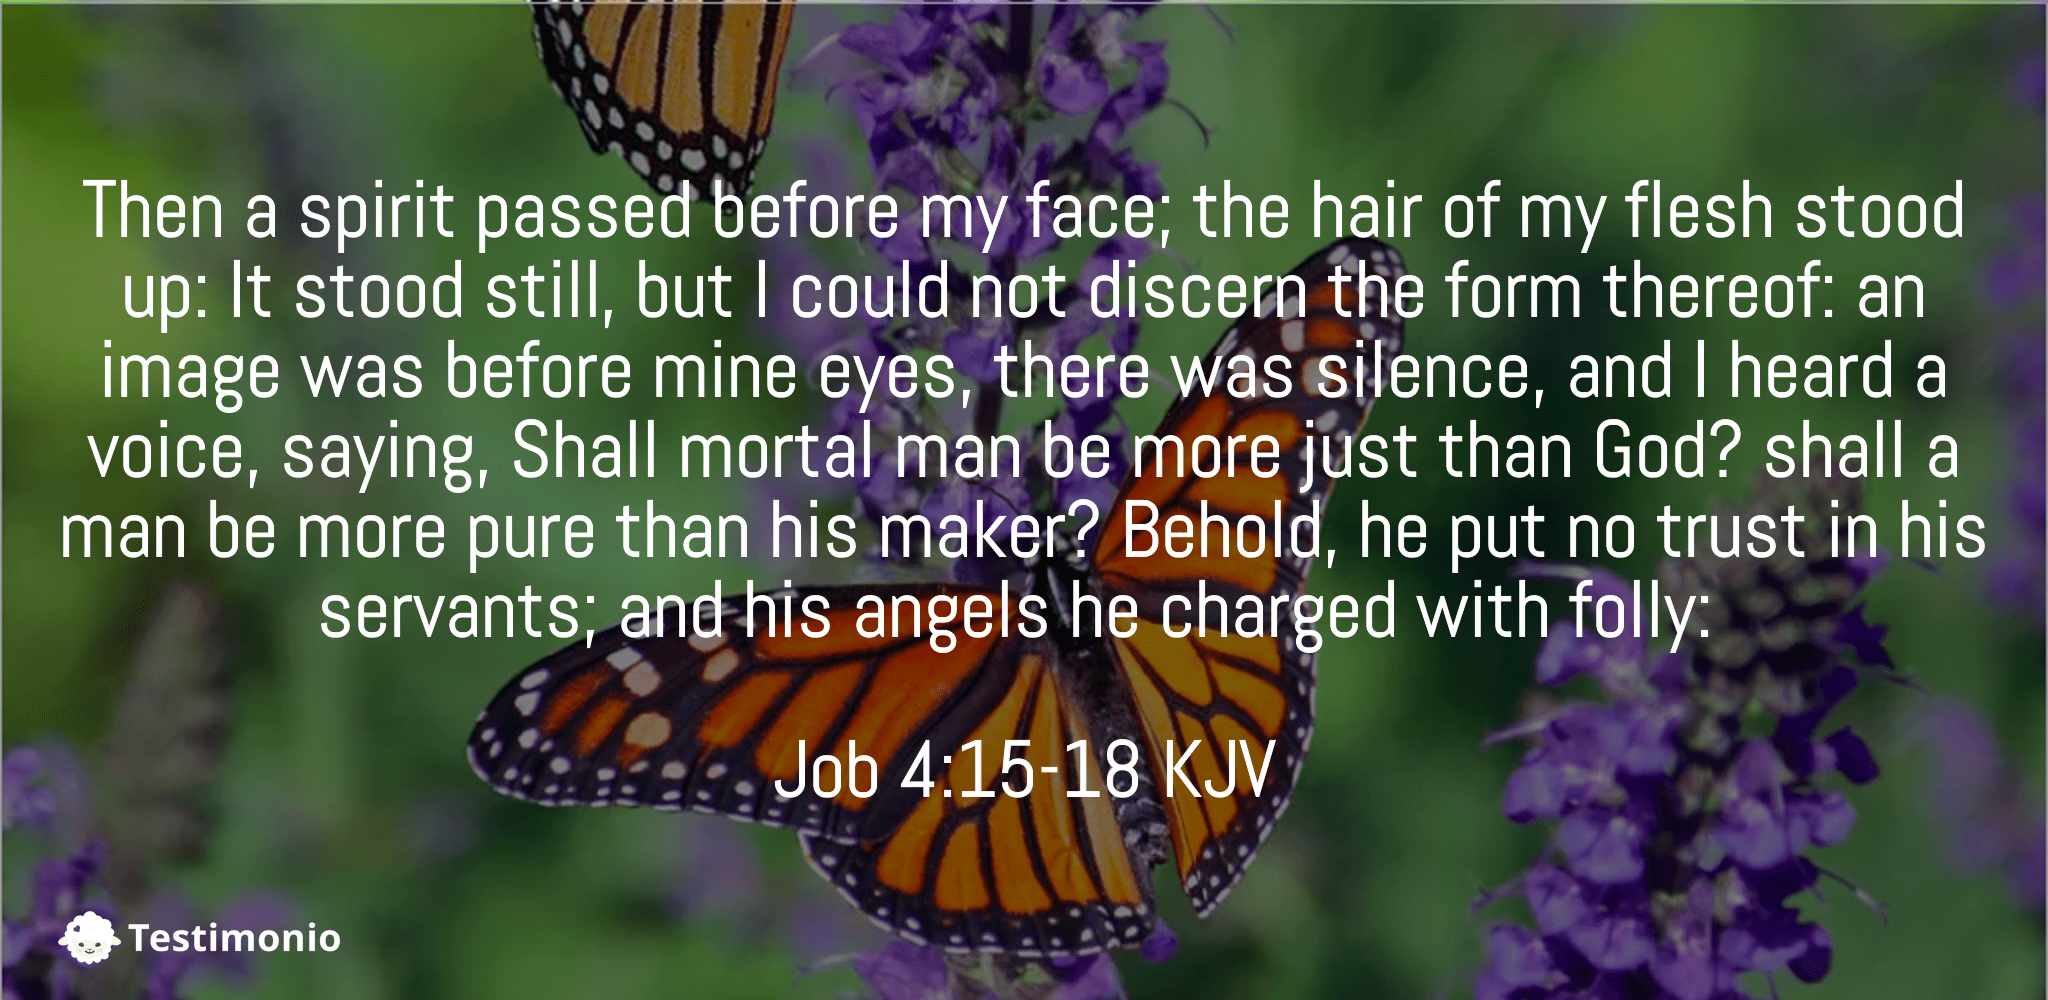 Job 4:15-18